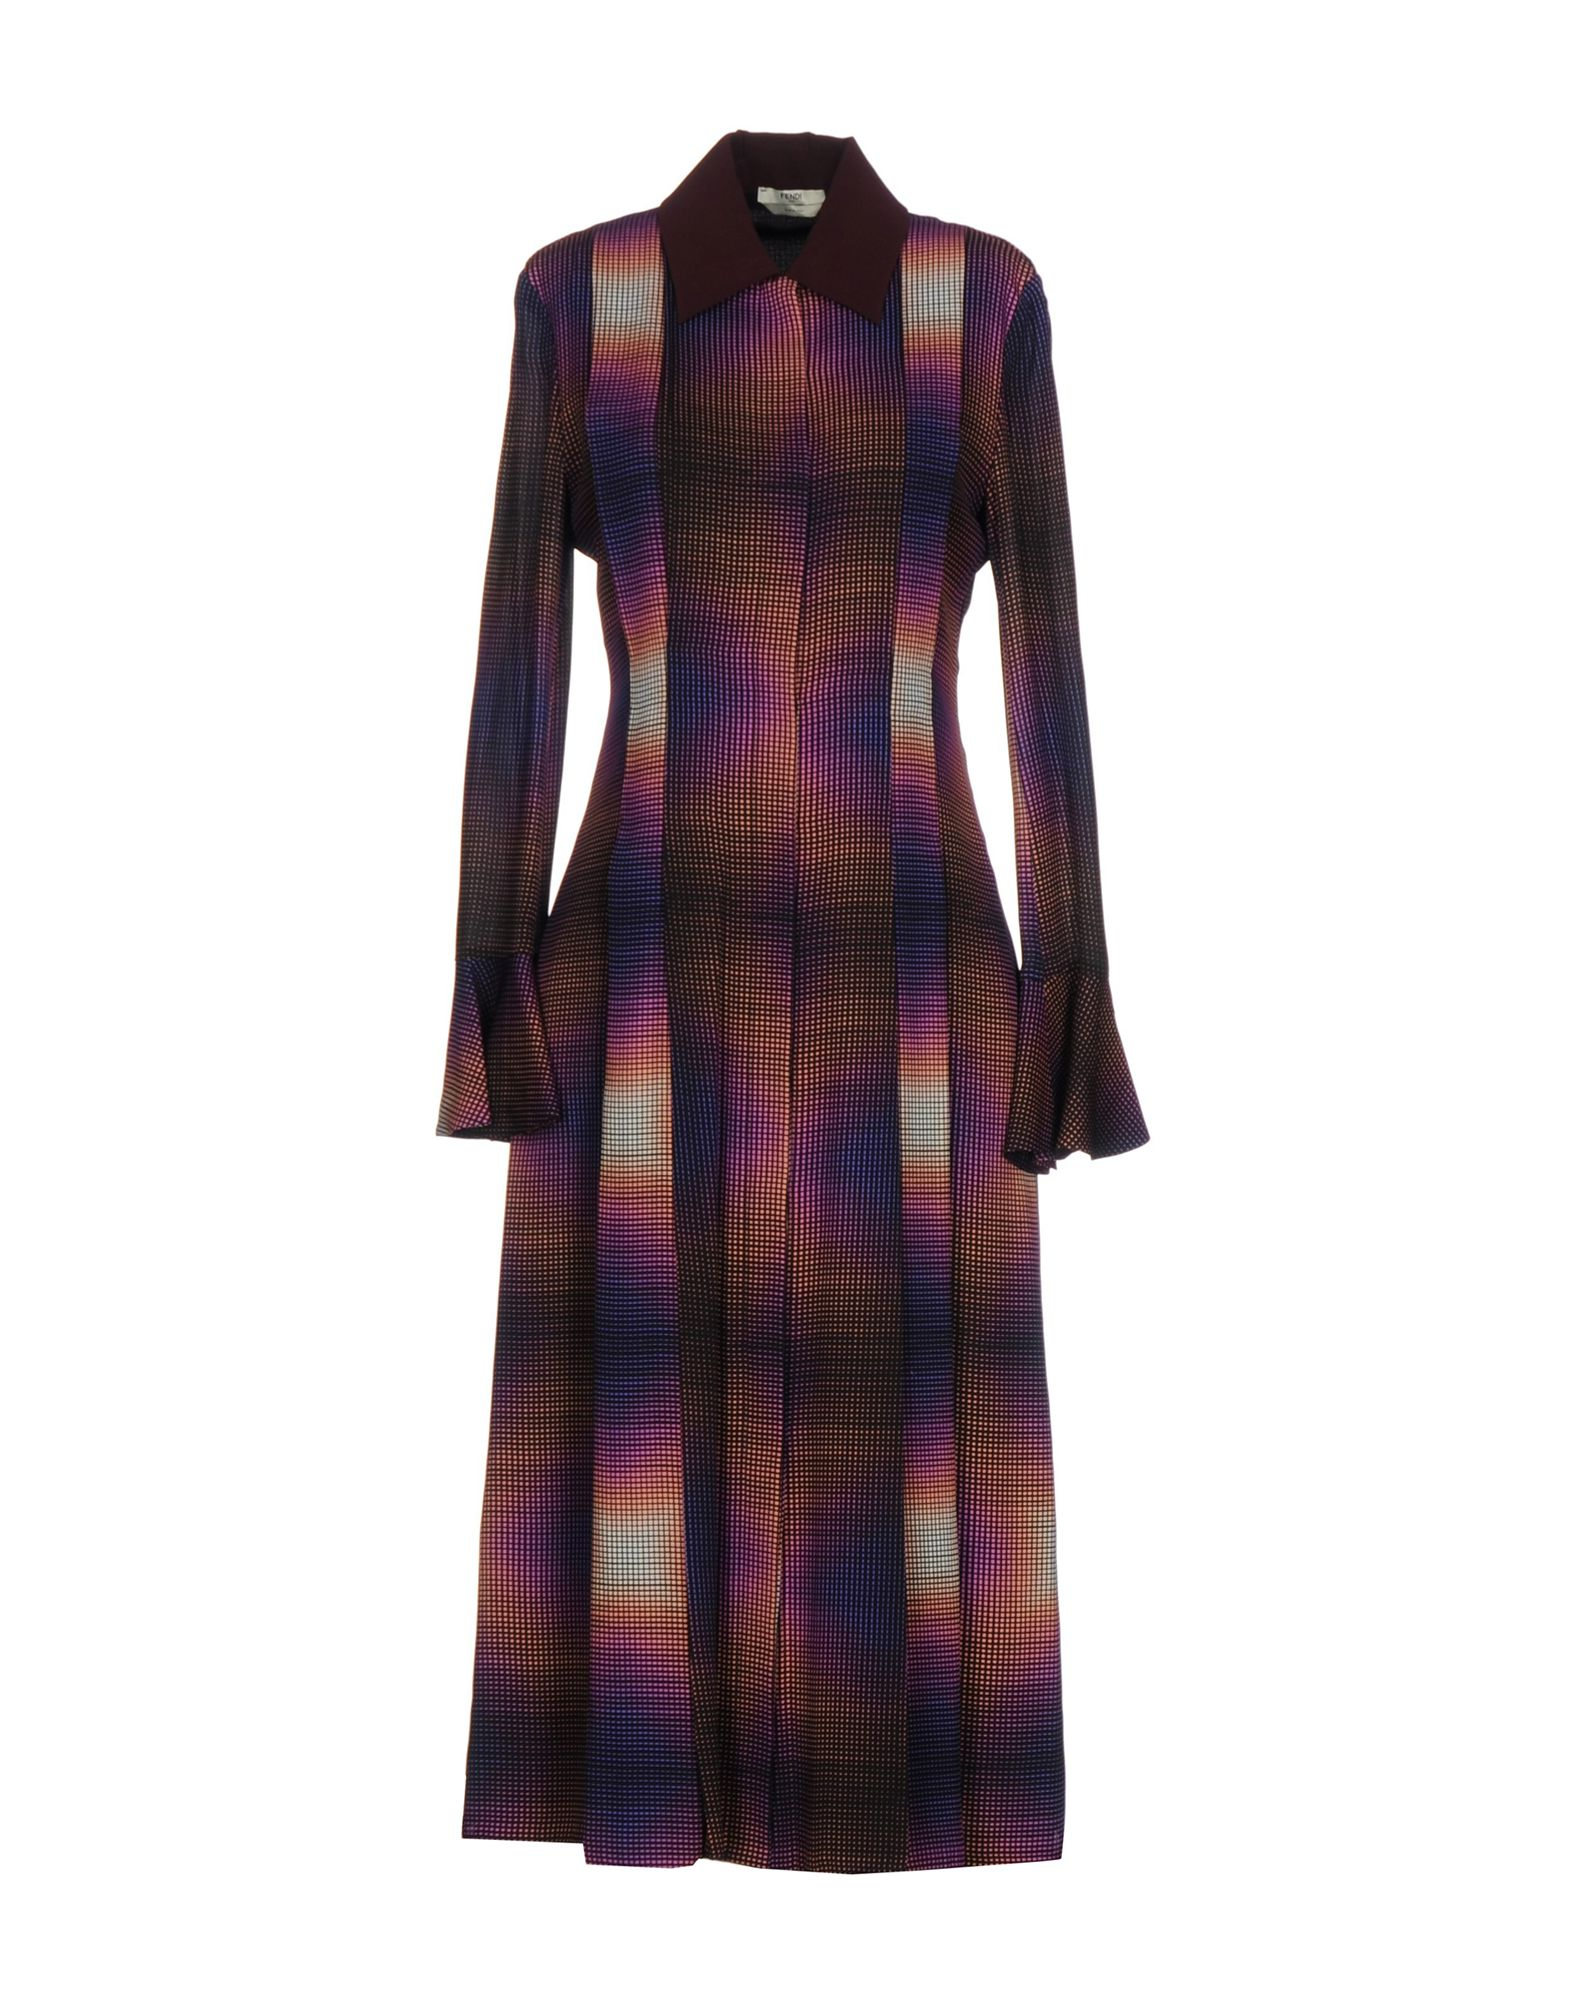 FENDI Платье длиной 3/4 zilli пуховик от zilli 69850